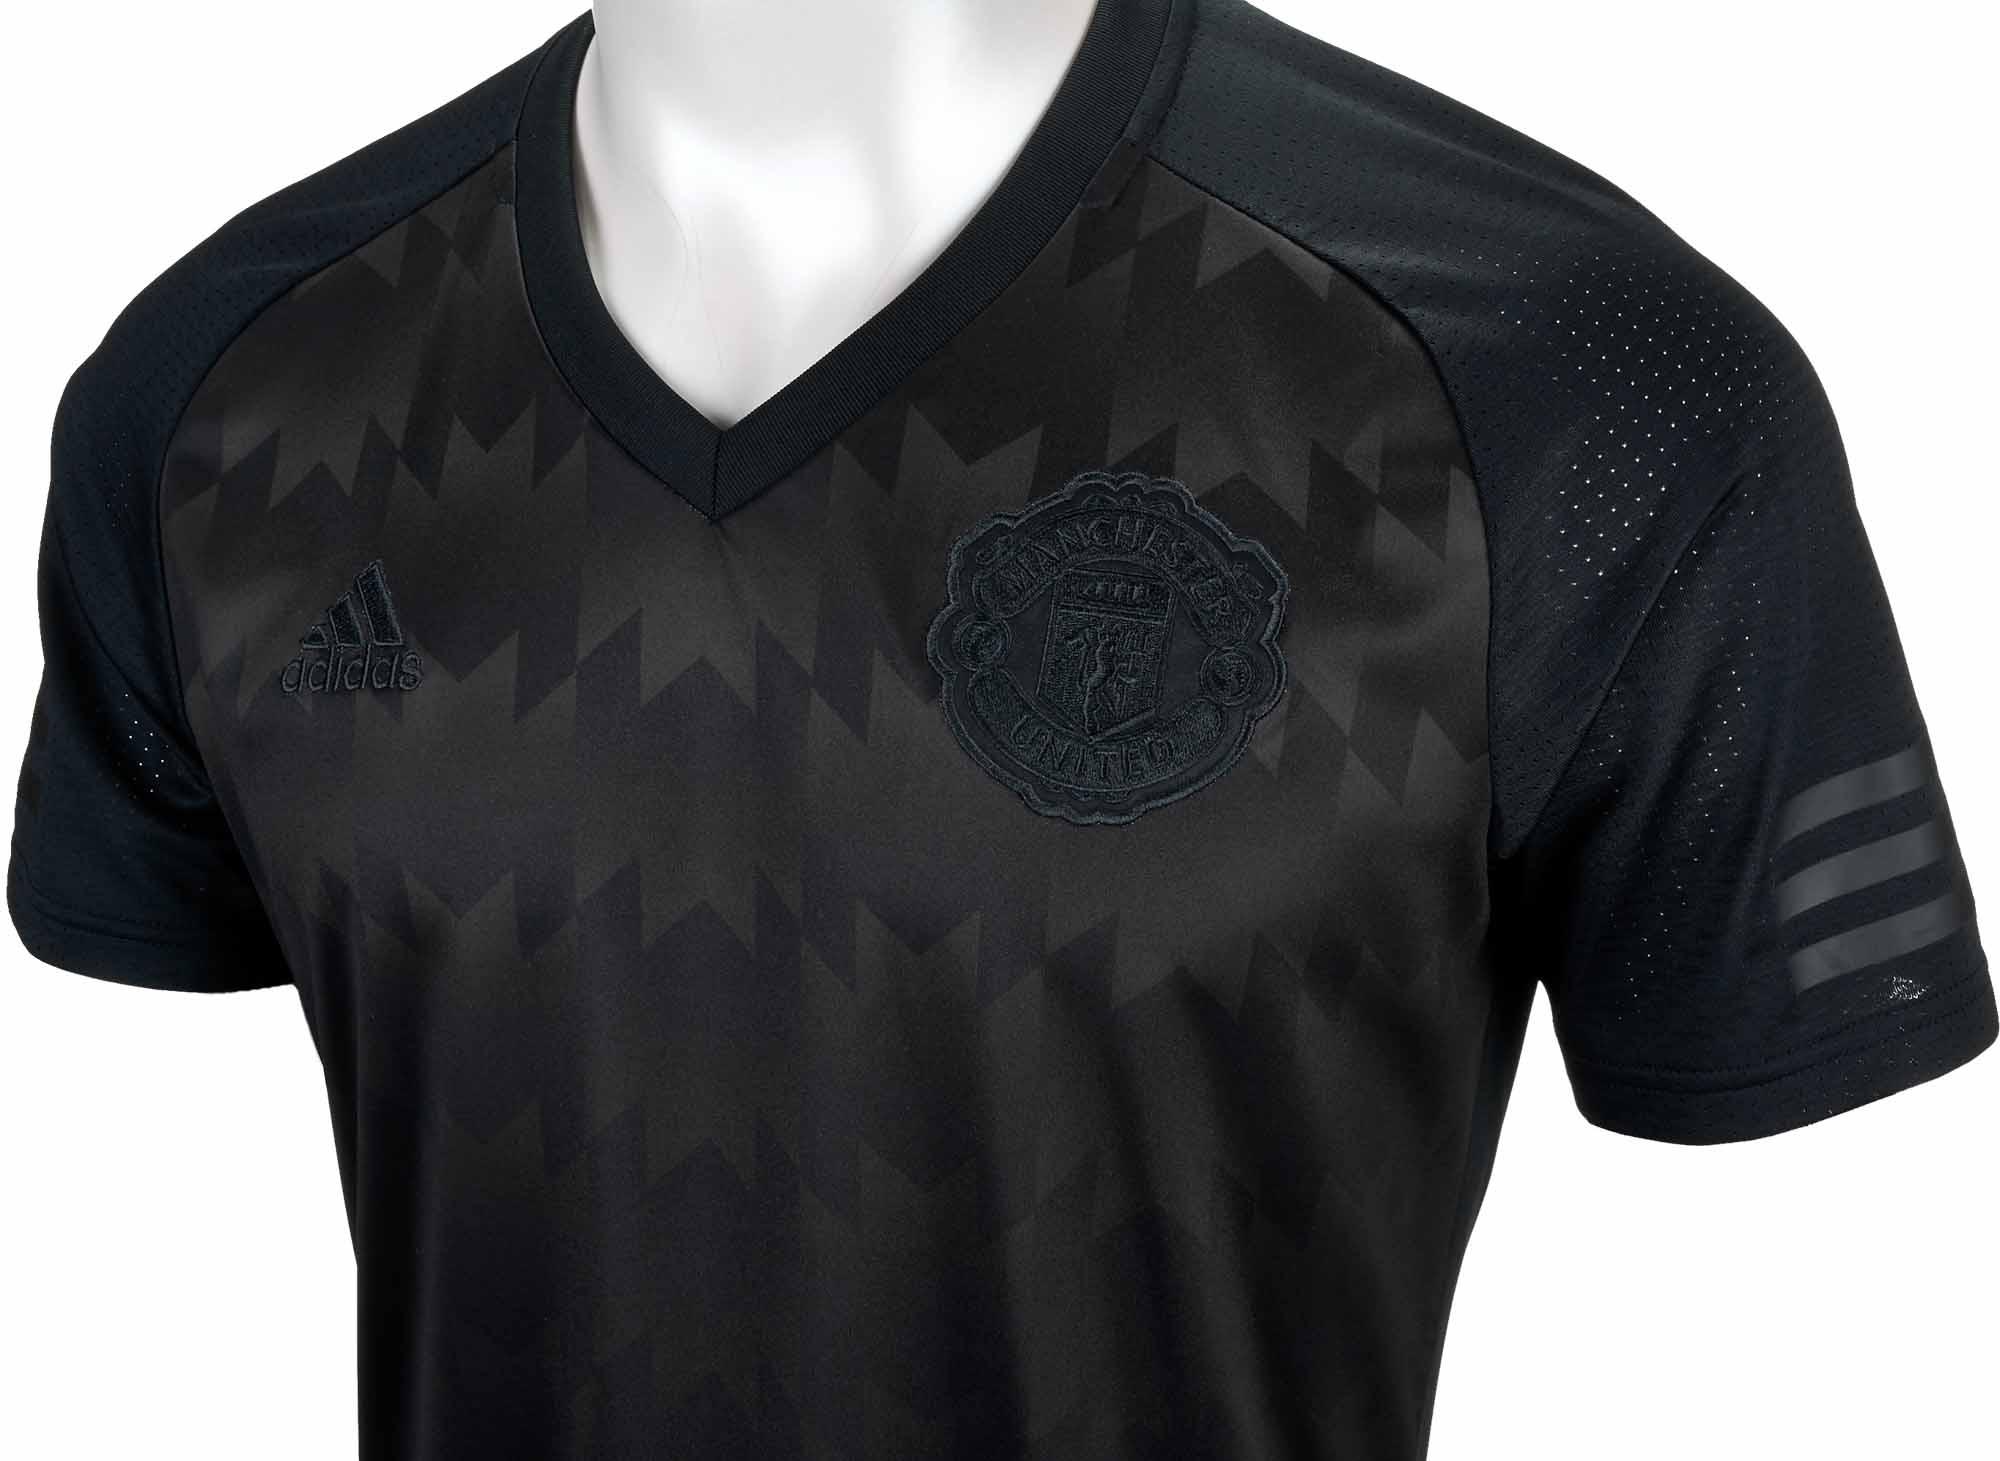 ed51fb5930506 adidas Manchester United SSP Tee - Winter Top - Black - SoccerPro